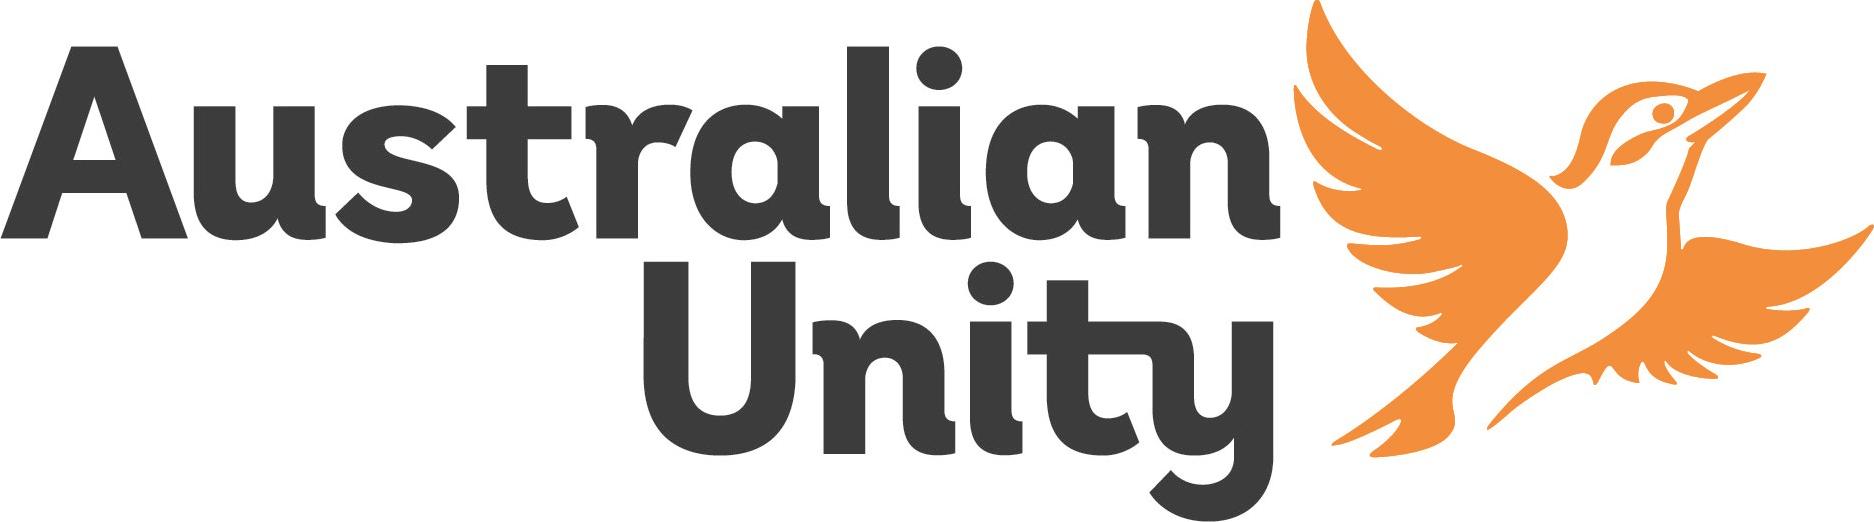 Australian unity office property fund investment medium run equilibrium output investment